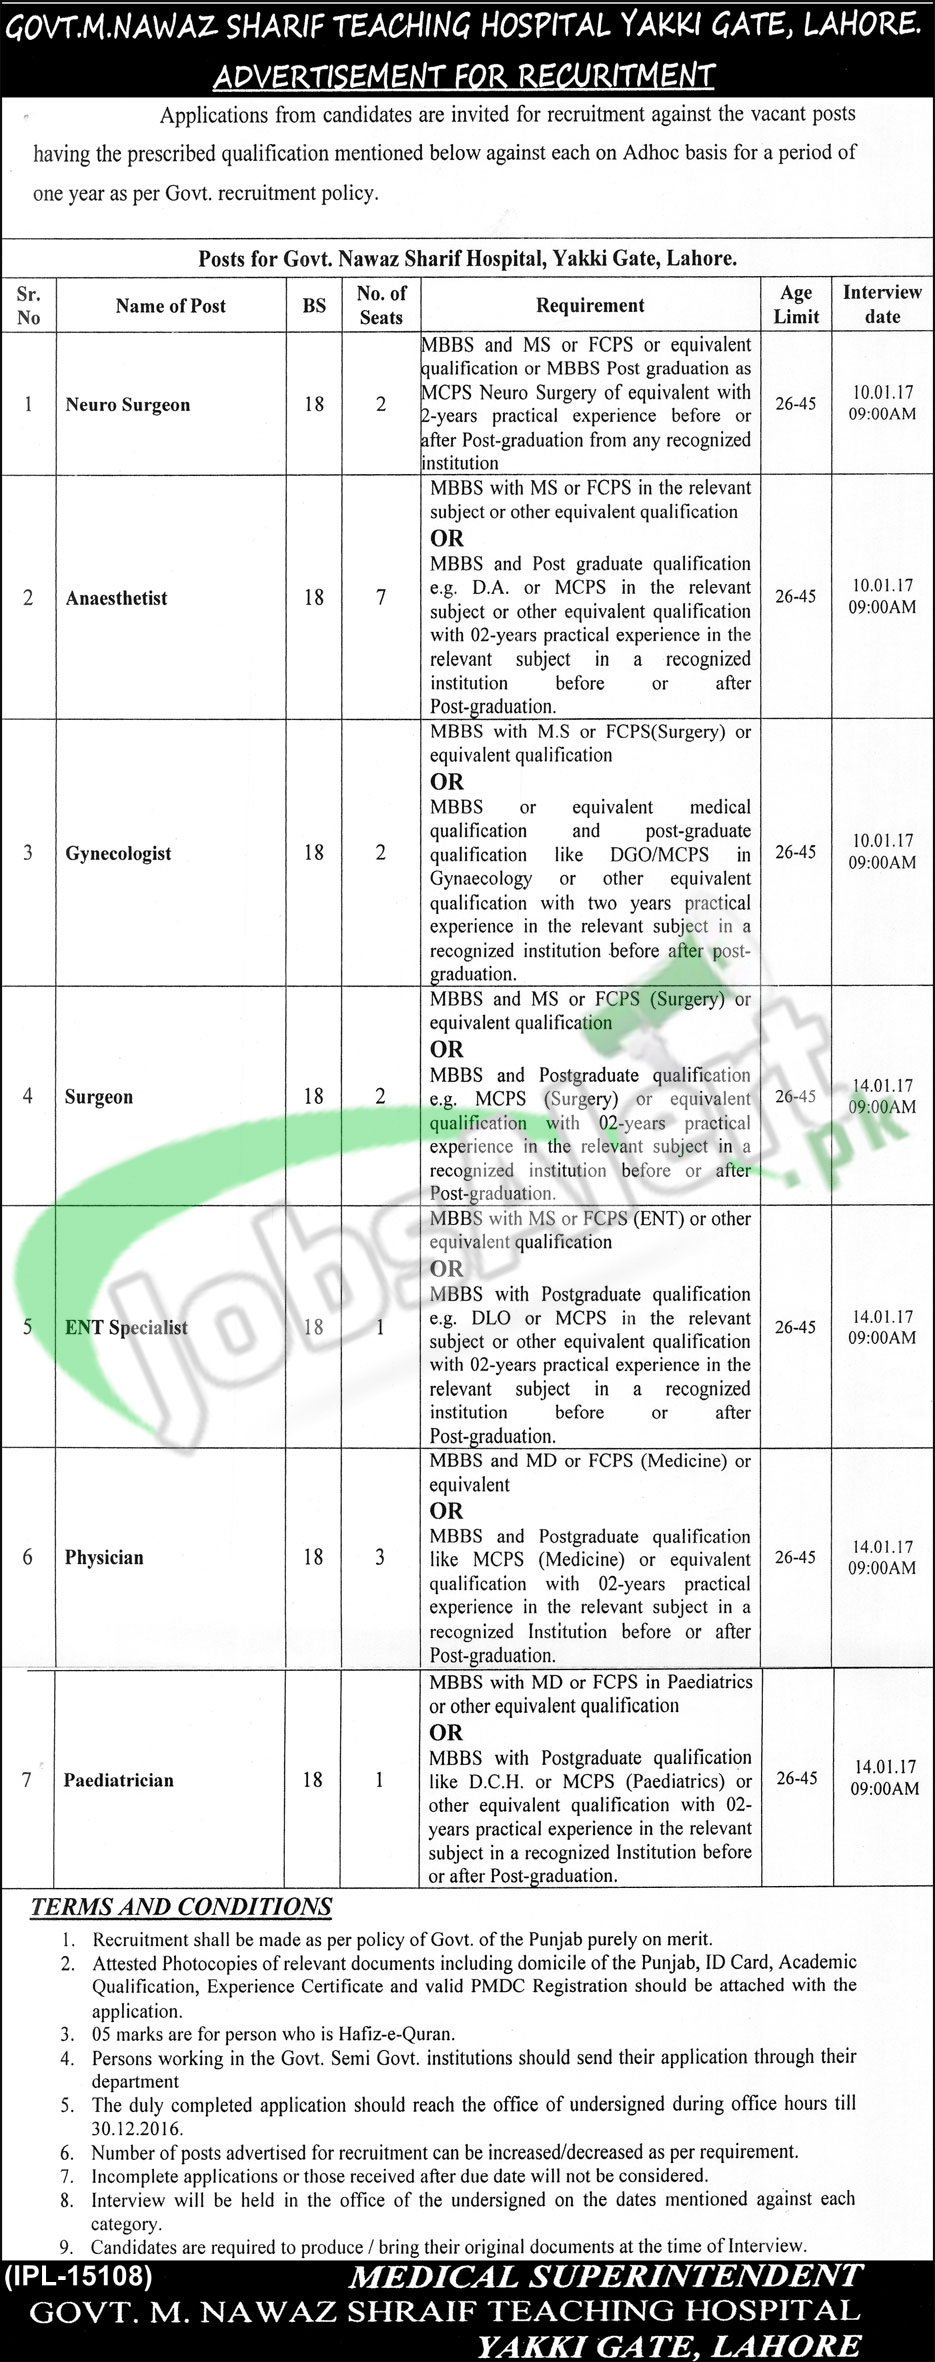 Govt M. Nawaz Sharif Teaching Hospital Lahore Jobs